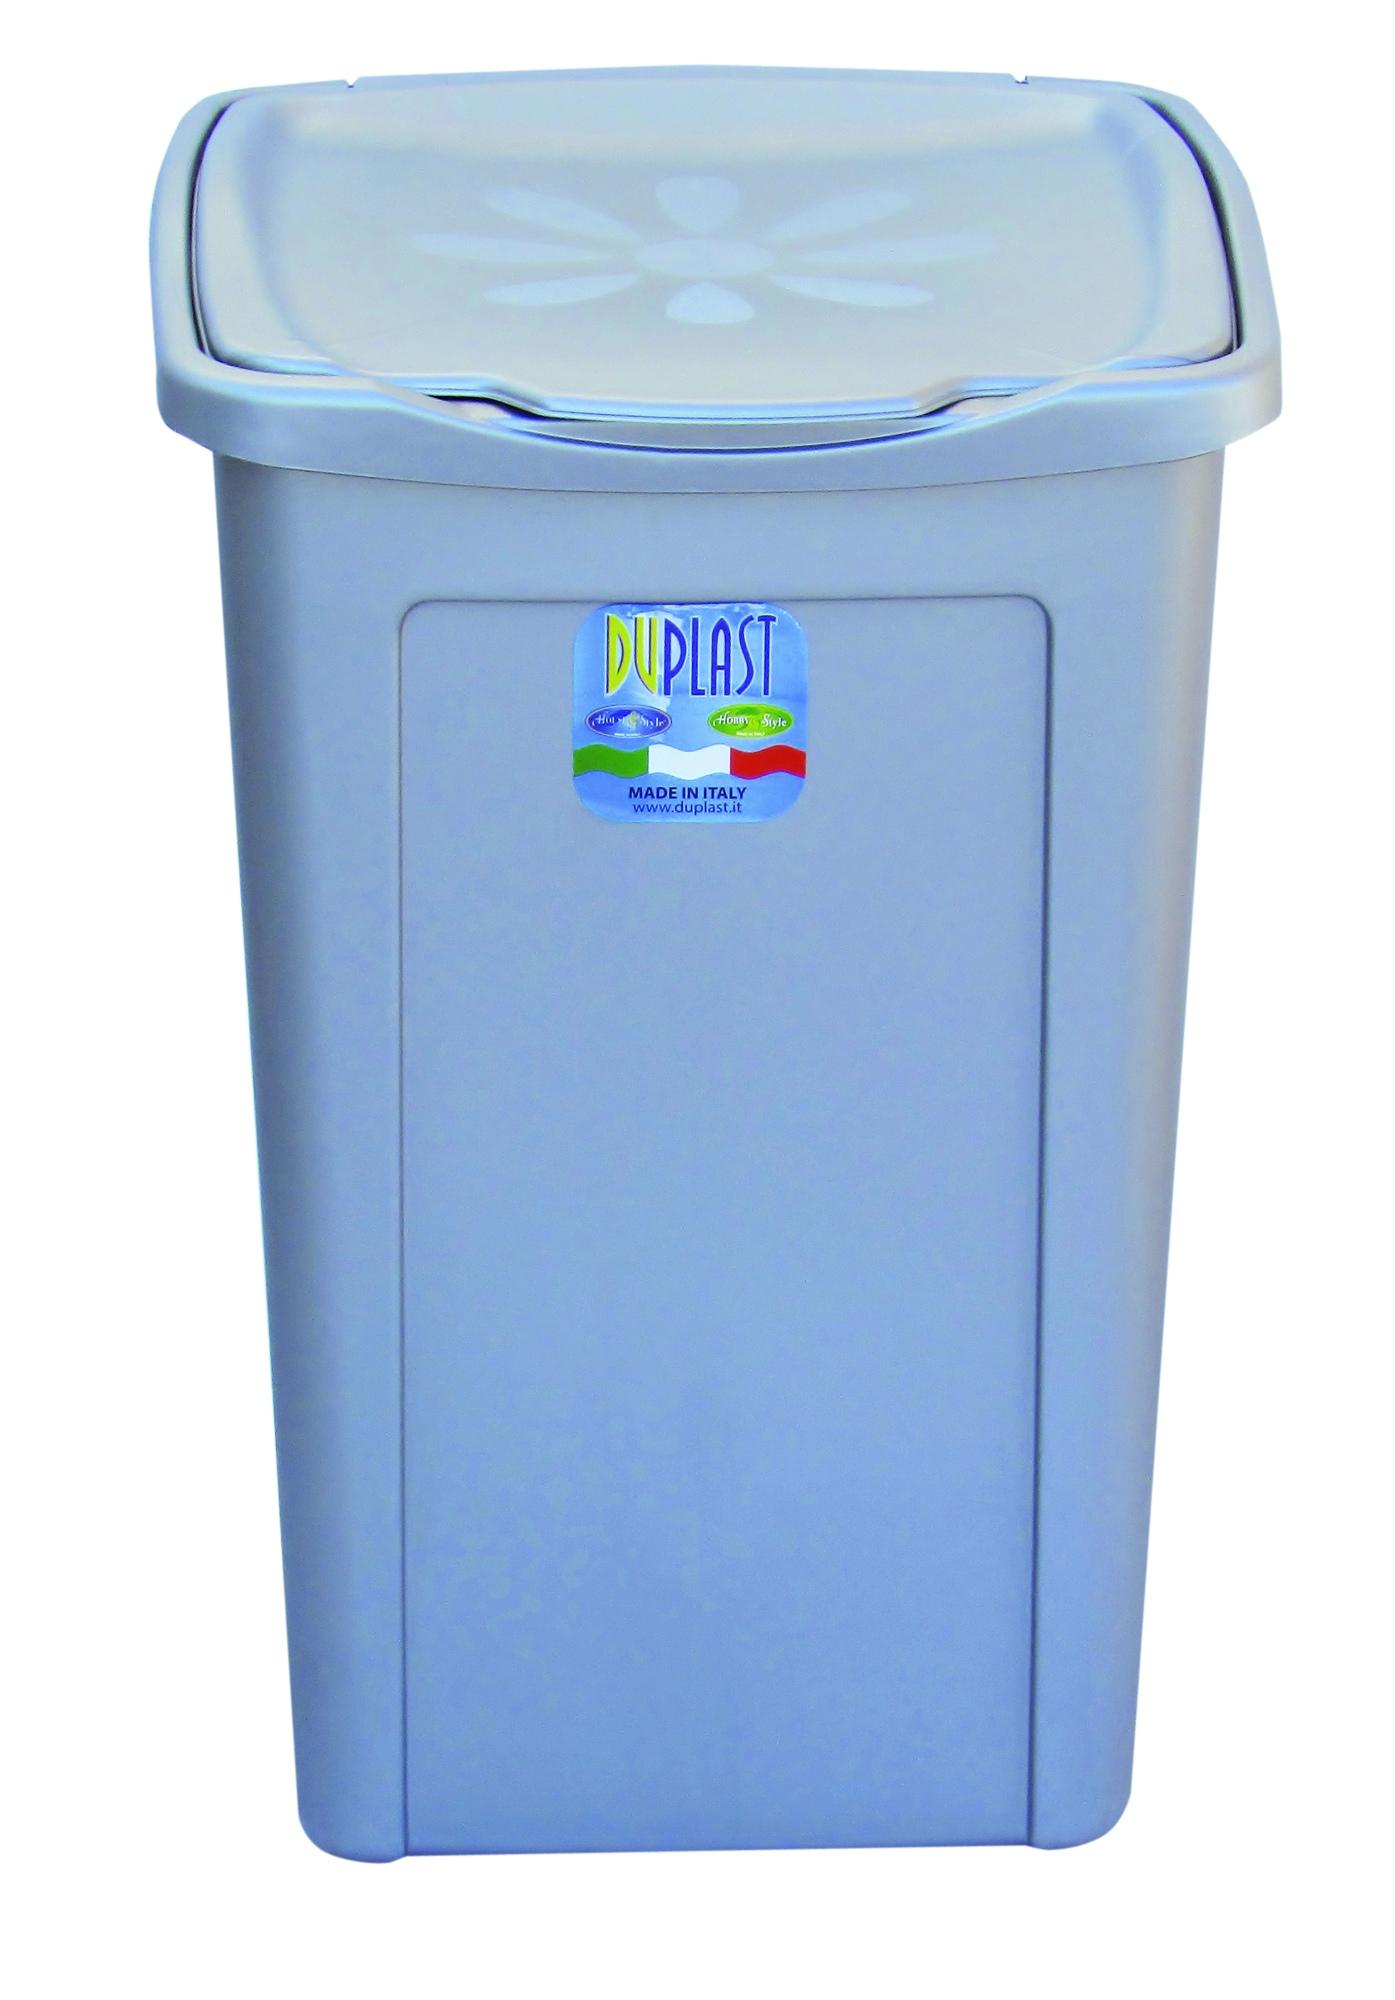 50 Litre Laundry Basket Lid Washing Bin Hamper Storage